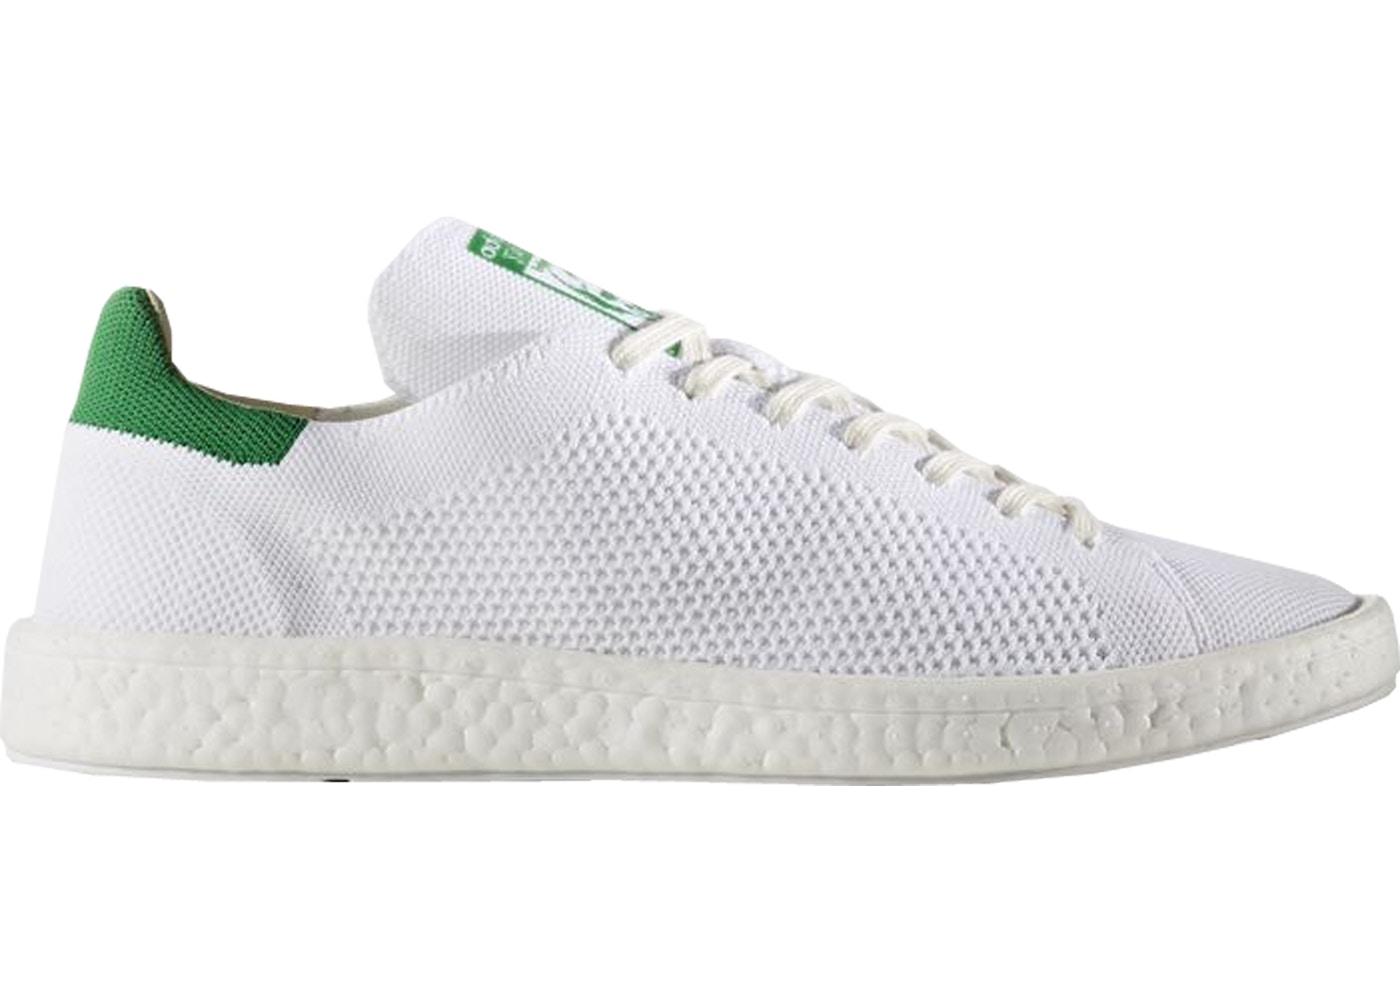 adidas Stan Smith Boost Primeknit White Green - BB0013